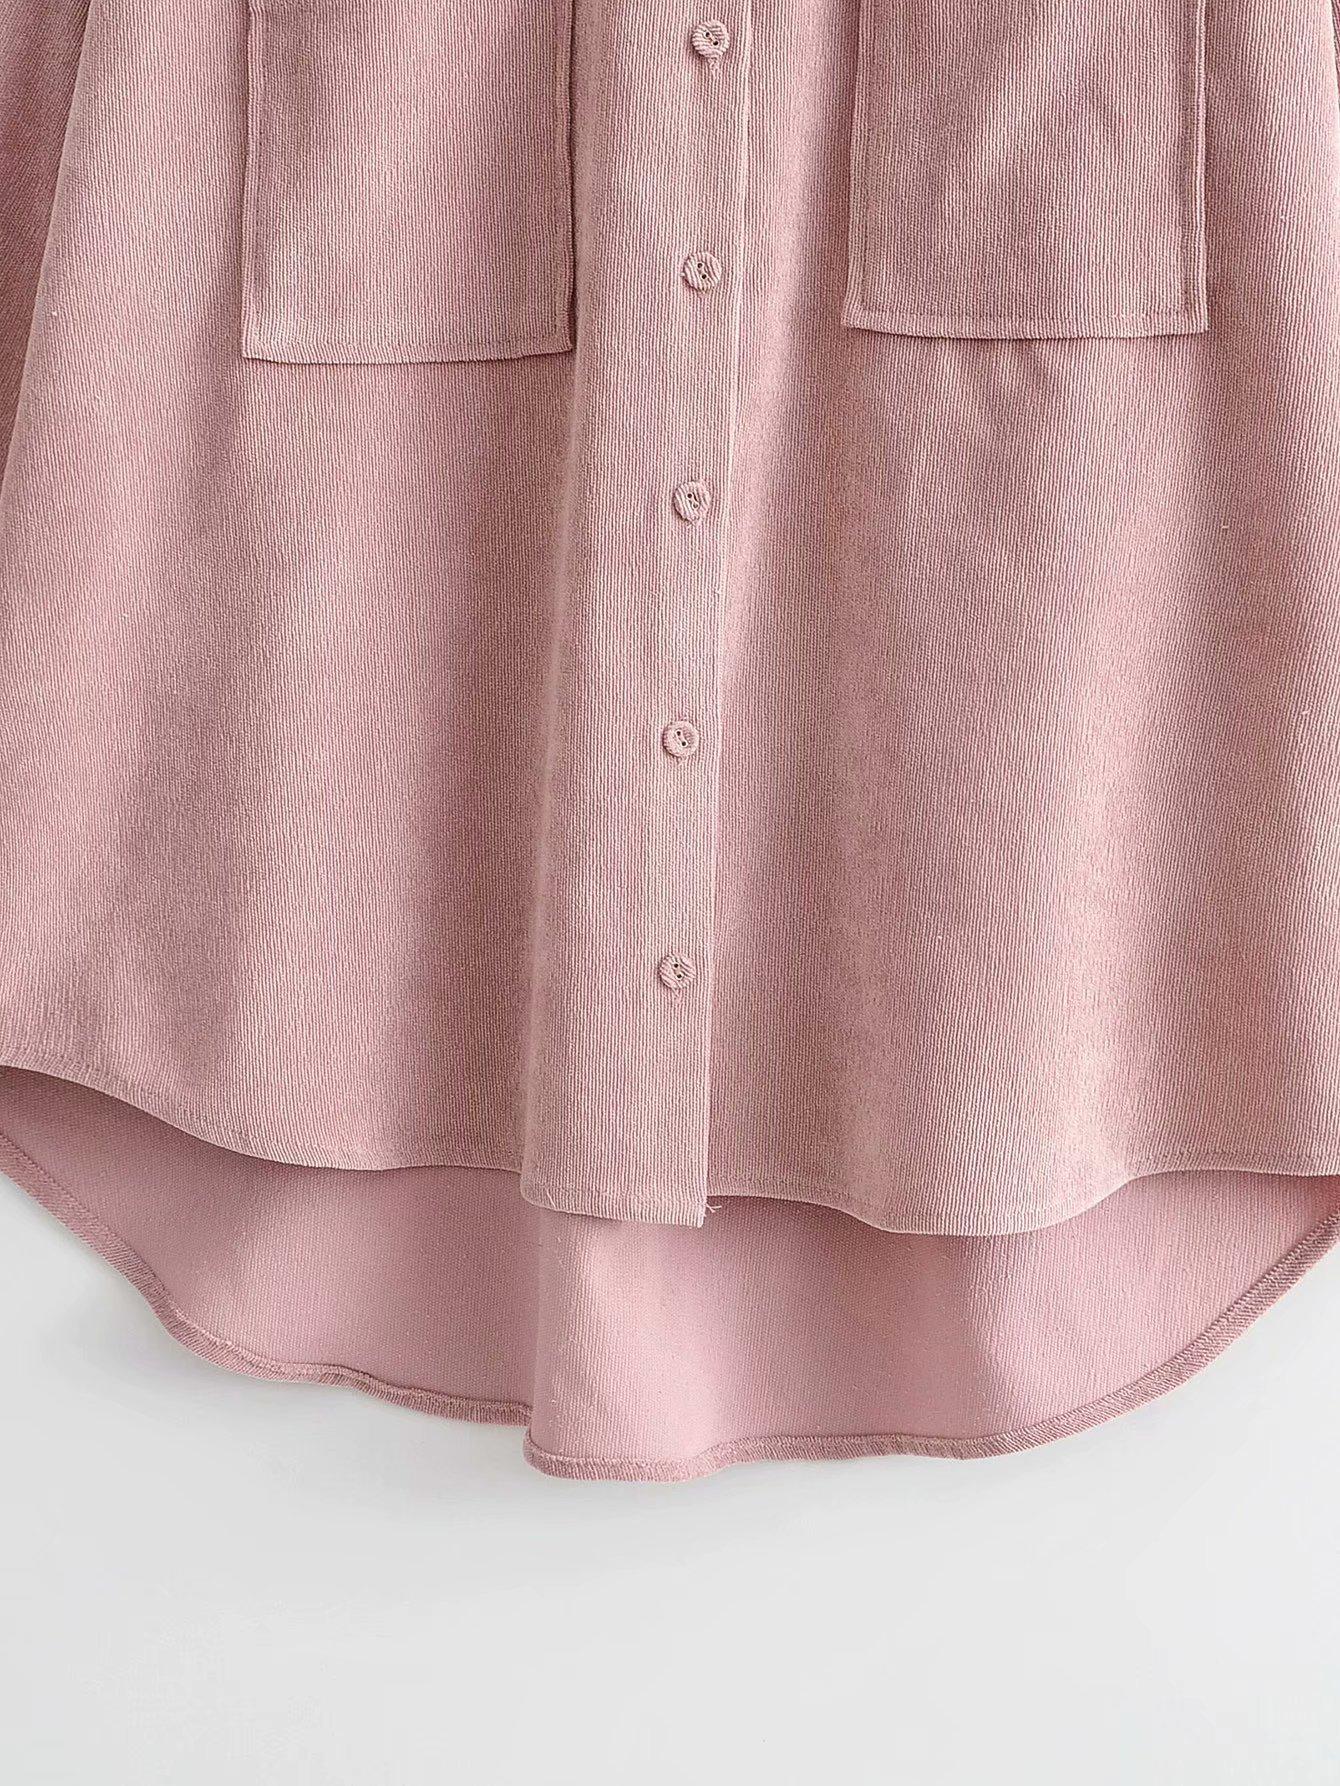 Wholesale 2019 Winter Loose Blouse Tops wholesales fashion NHAM182069